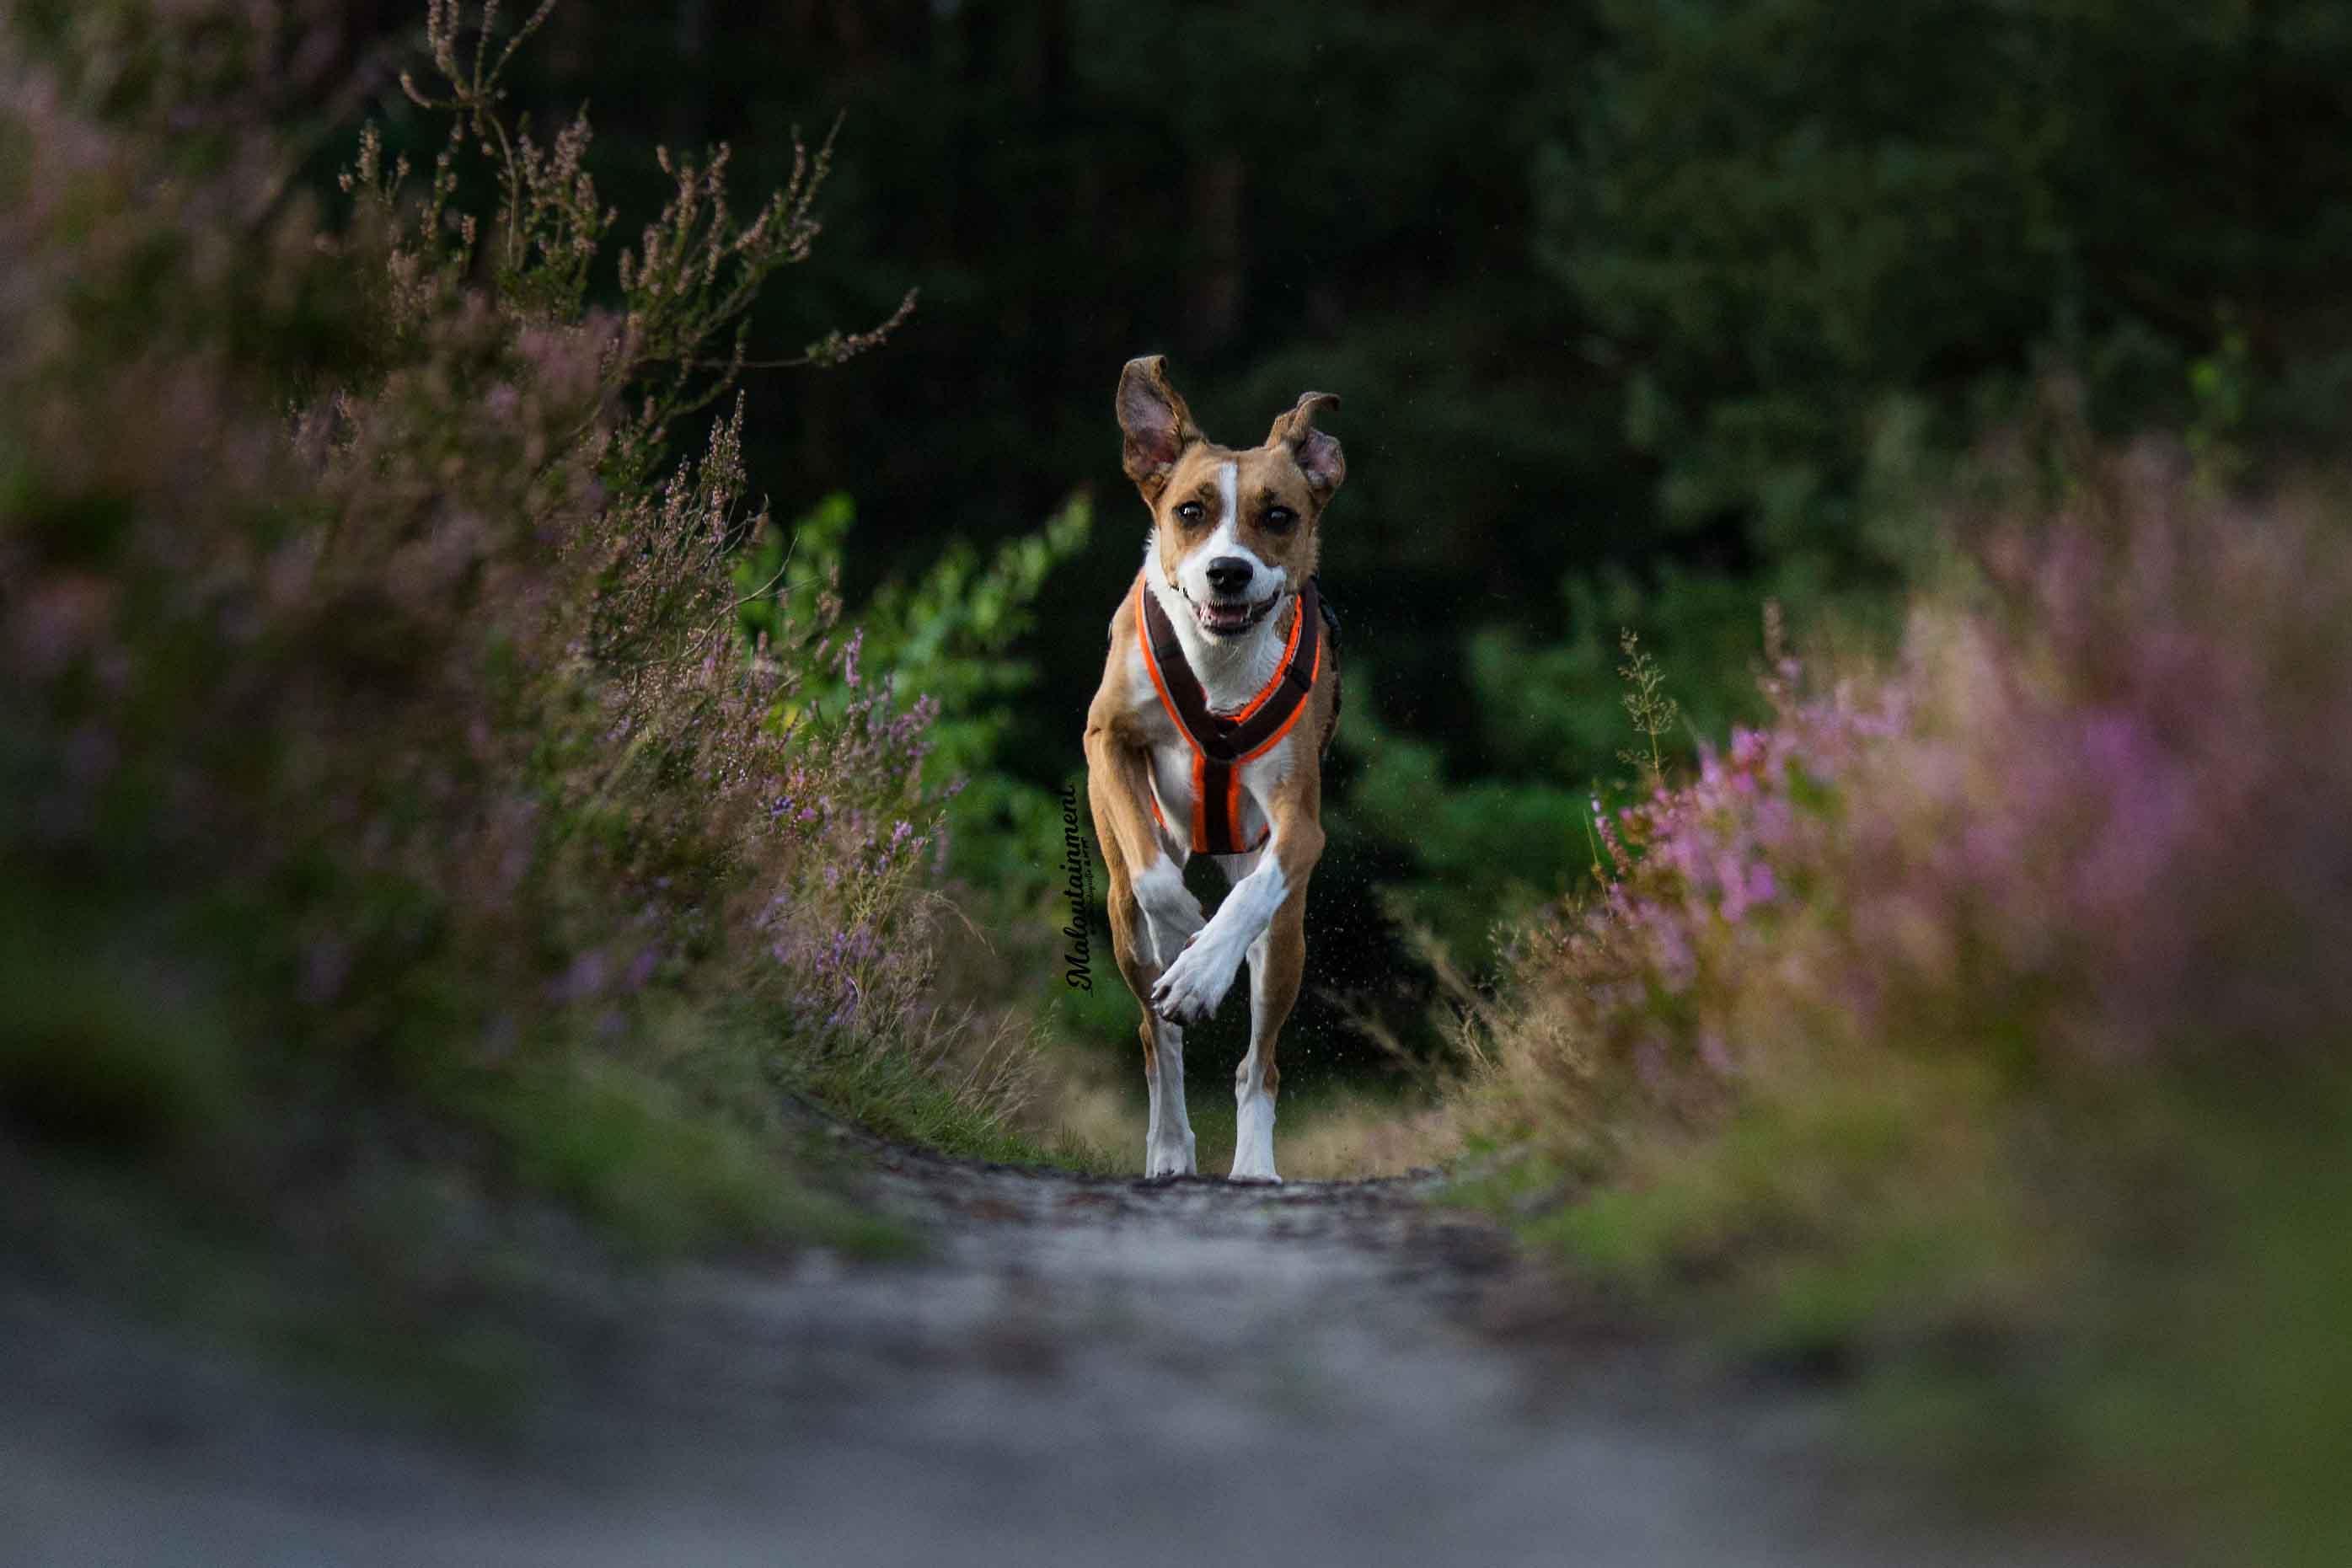 Maloutainment-Mischling-Hund-Fotografie-Huendin-Frau-Freundschaft-Fotografin-Hannover-Celle-Heide-Blumen-Niedersachen-Blog-Hundefotografie-Charakter-einzelshooting